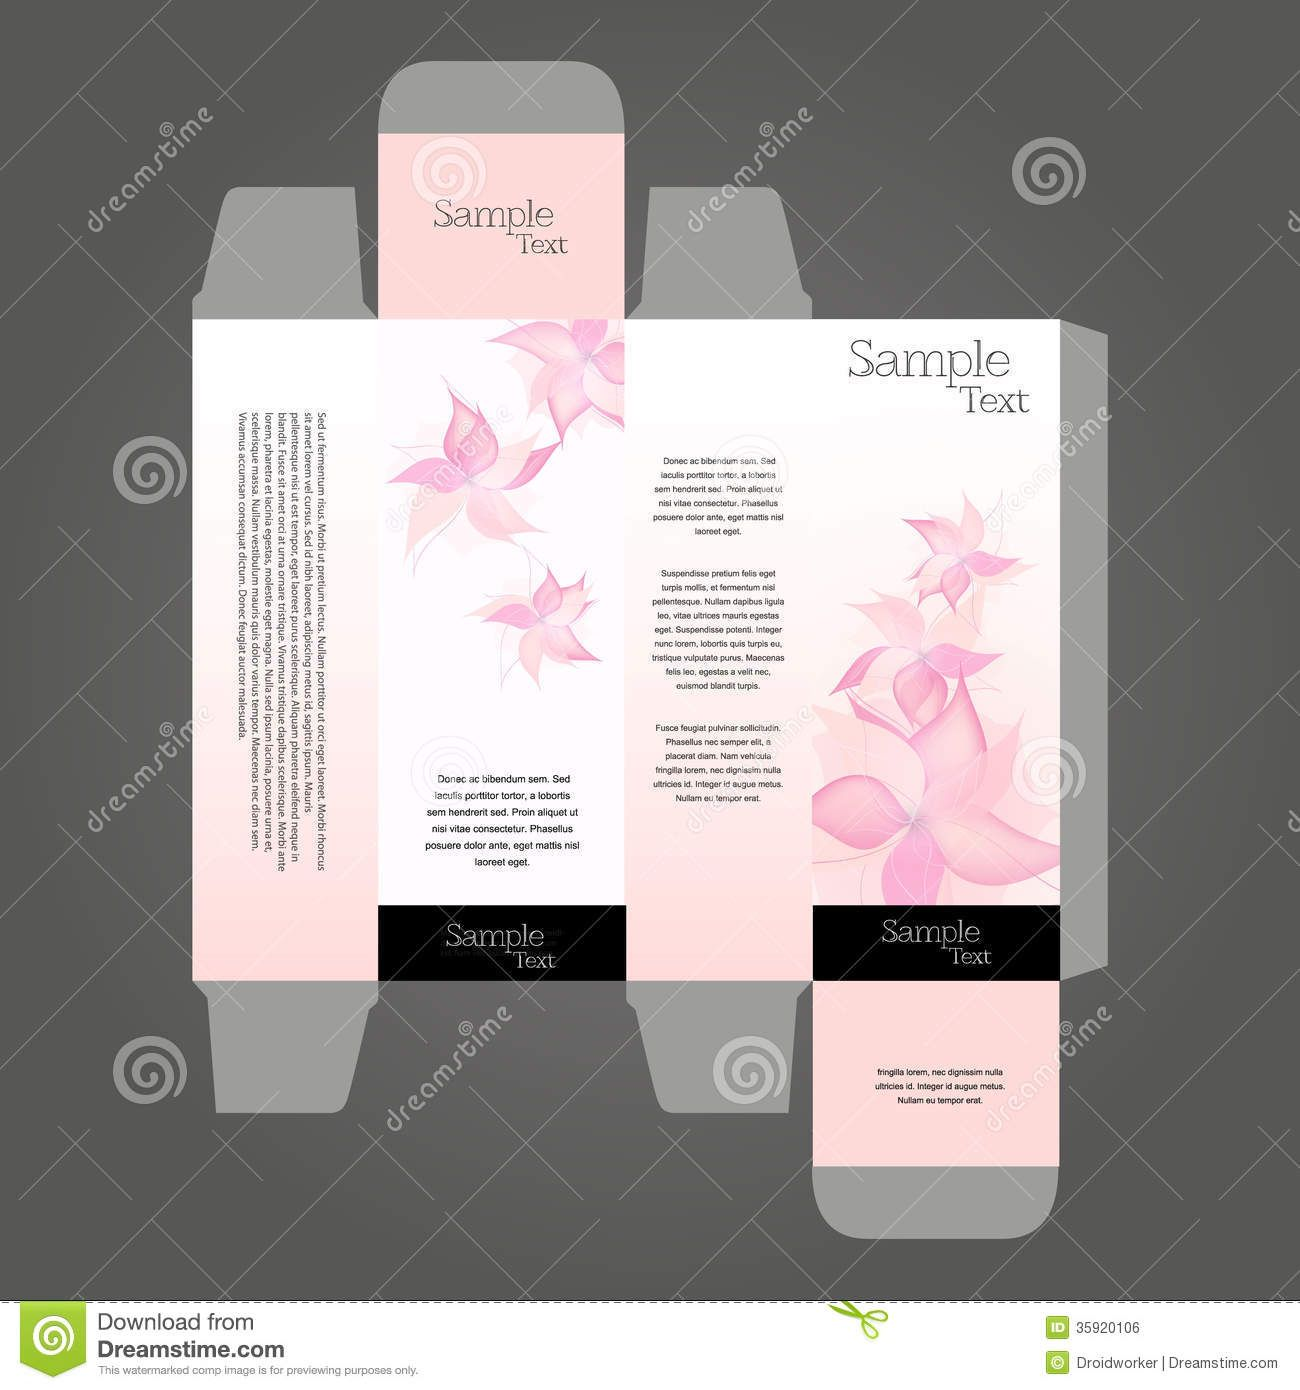 Adobe Illustrator Packaging Box Design Sample